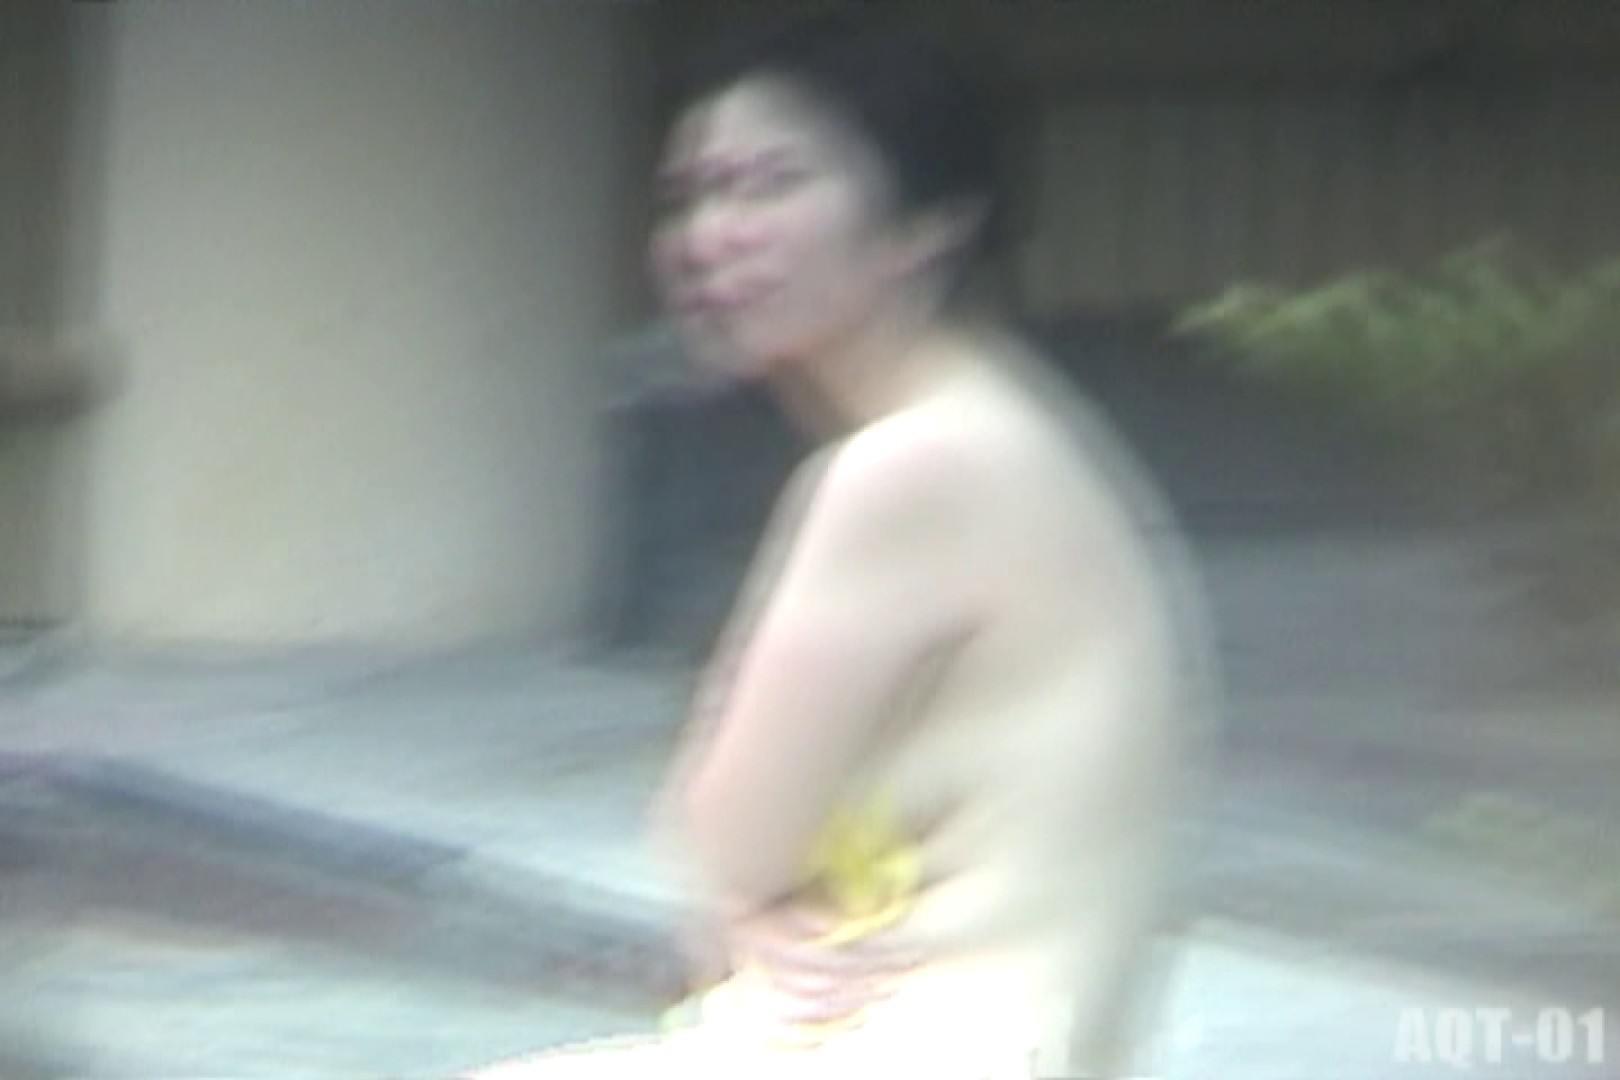 Aquaな露天風呂Vol.717 綺麗なOLたち  61枚 54